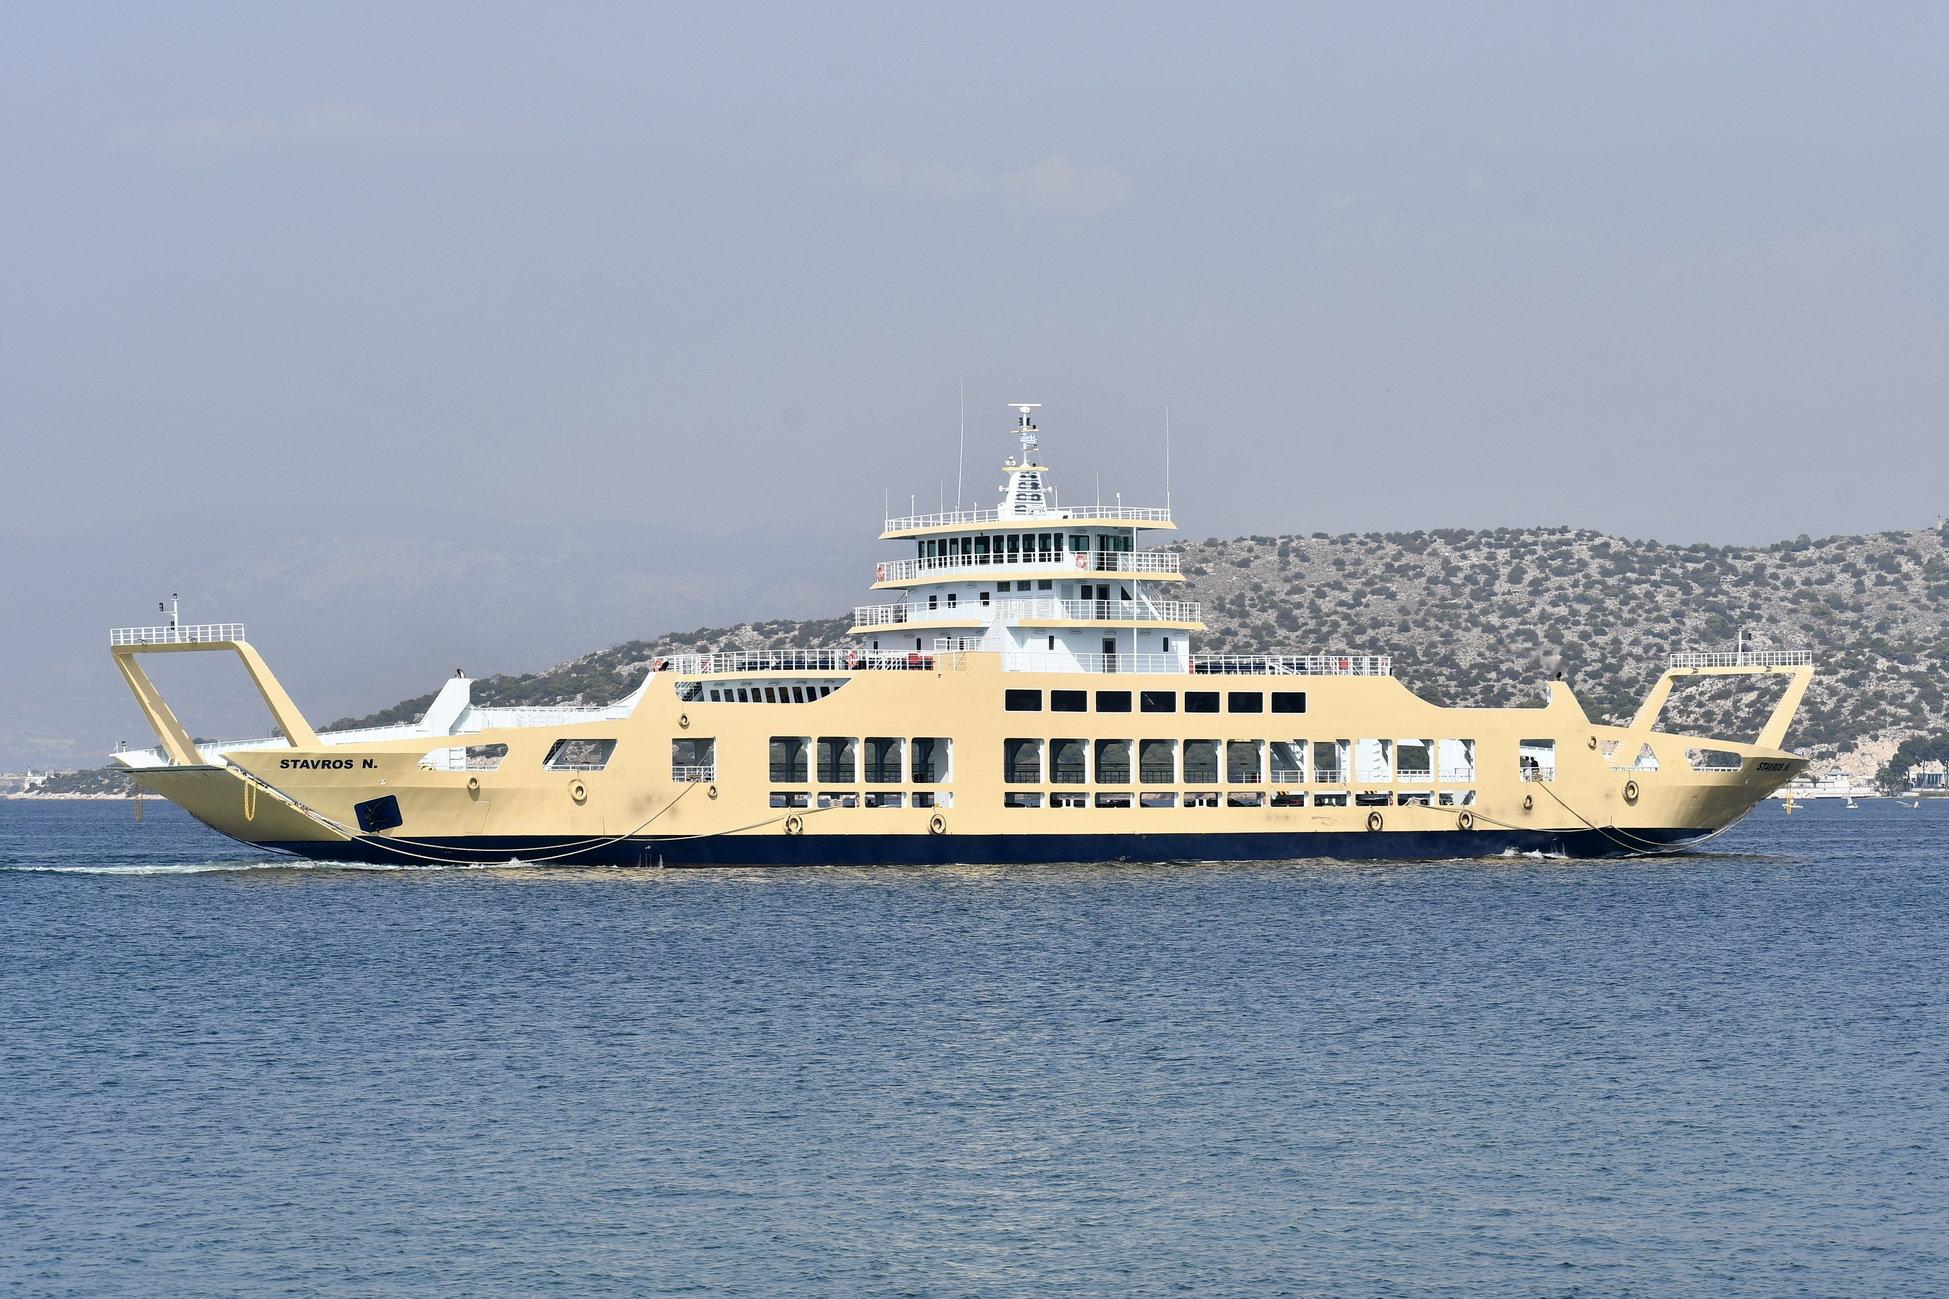 Stavros N_20-10-18_Salamina Strait_2